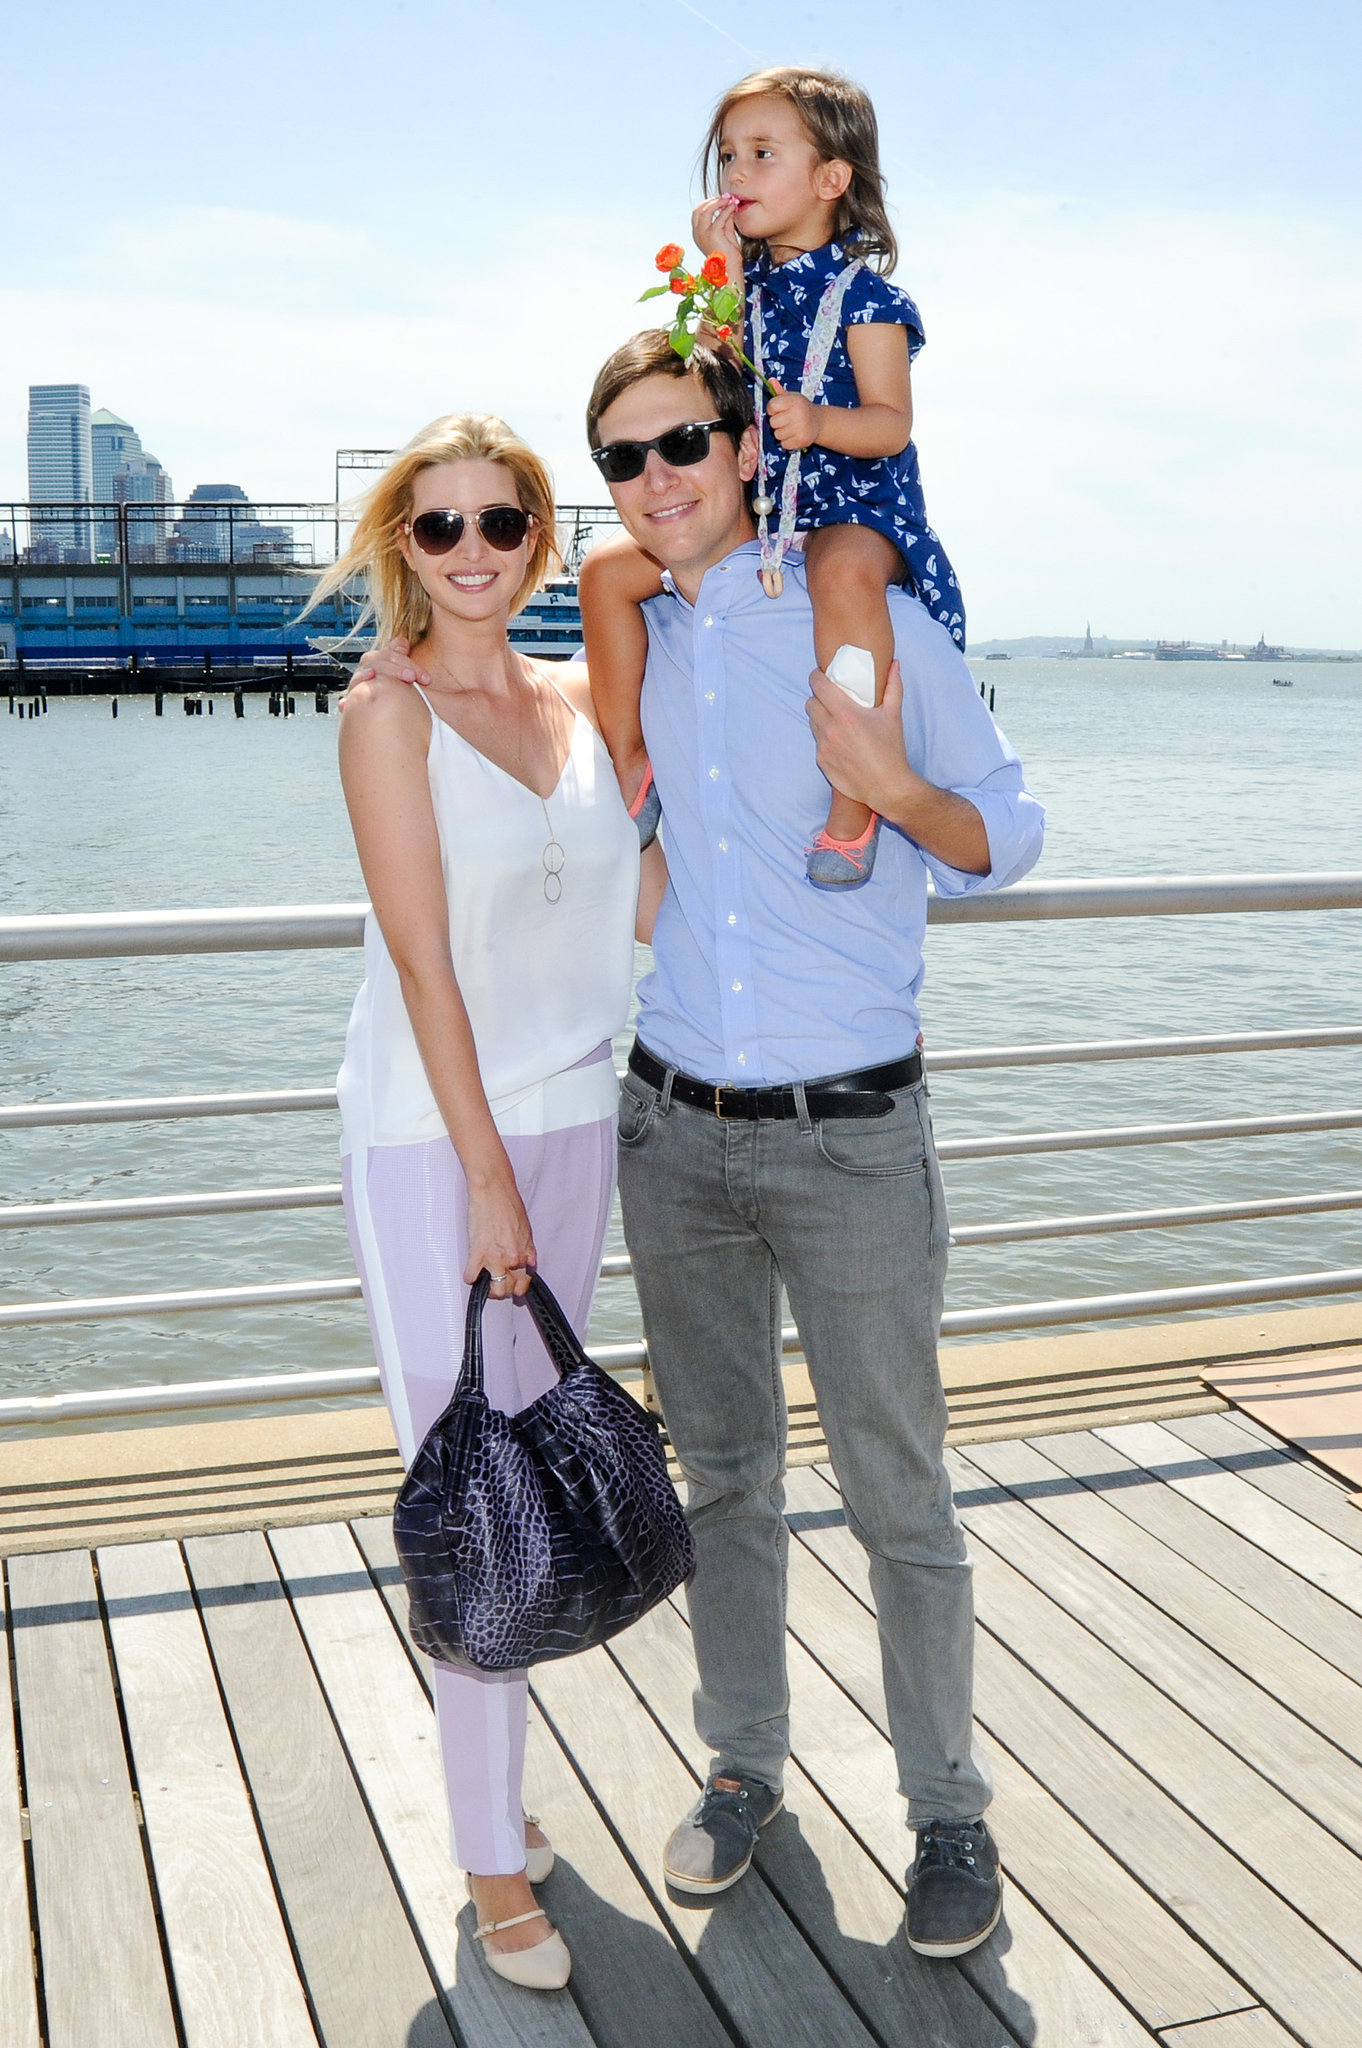 Ivanka Trump and Jared Kushner brought their daughter, Arabella Kushner, to the party.